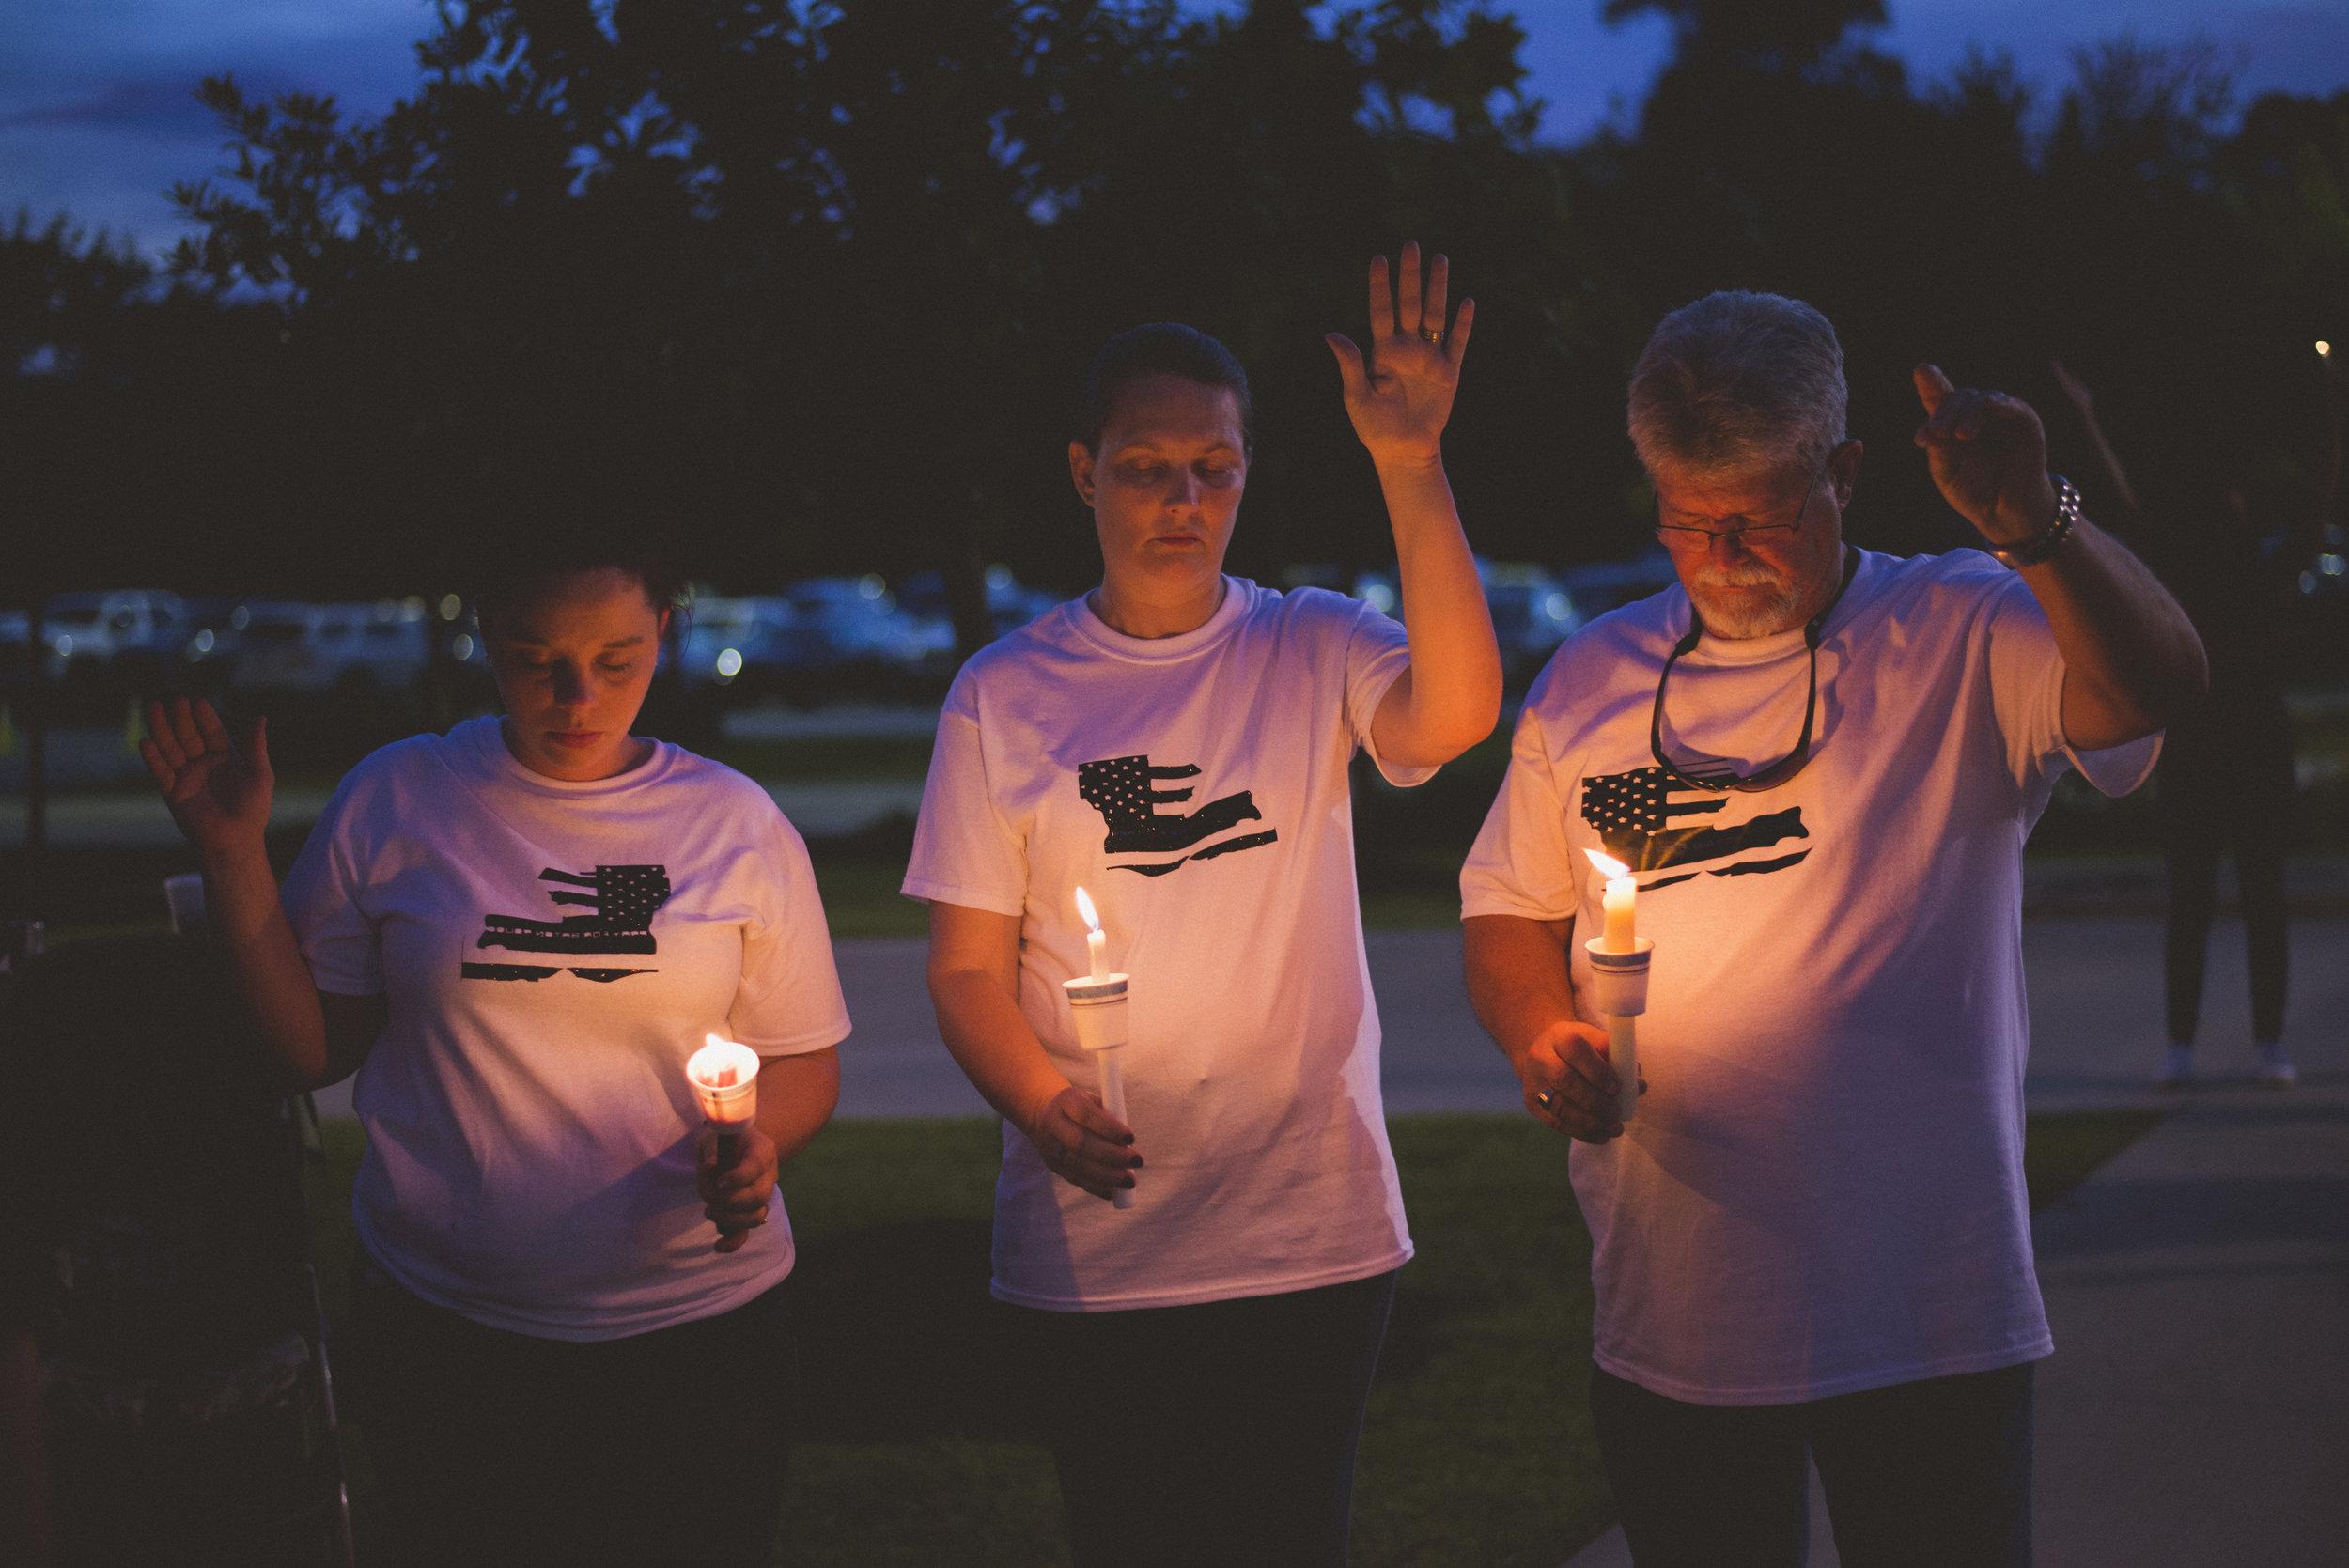 Candlelight Vigil for Matthew Gerald_Allie Appel_16.jpg